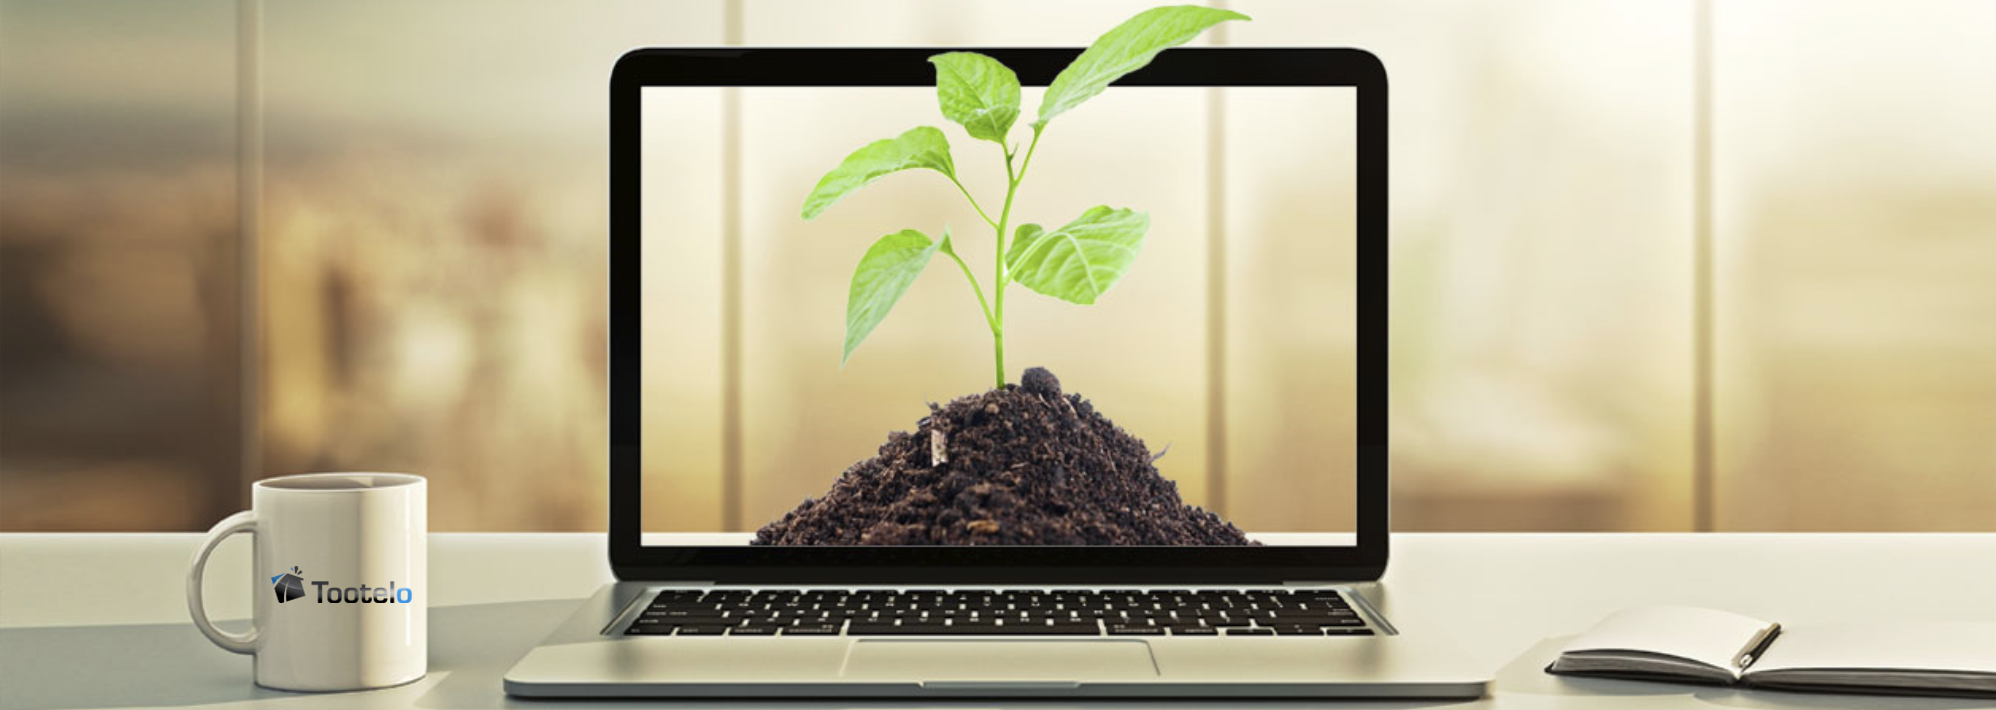 environment technologie laptop